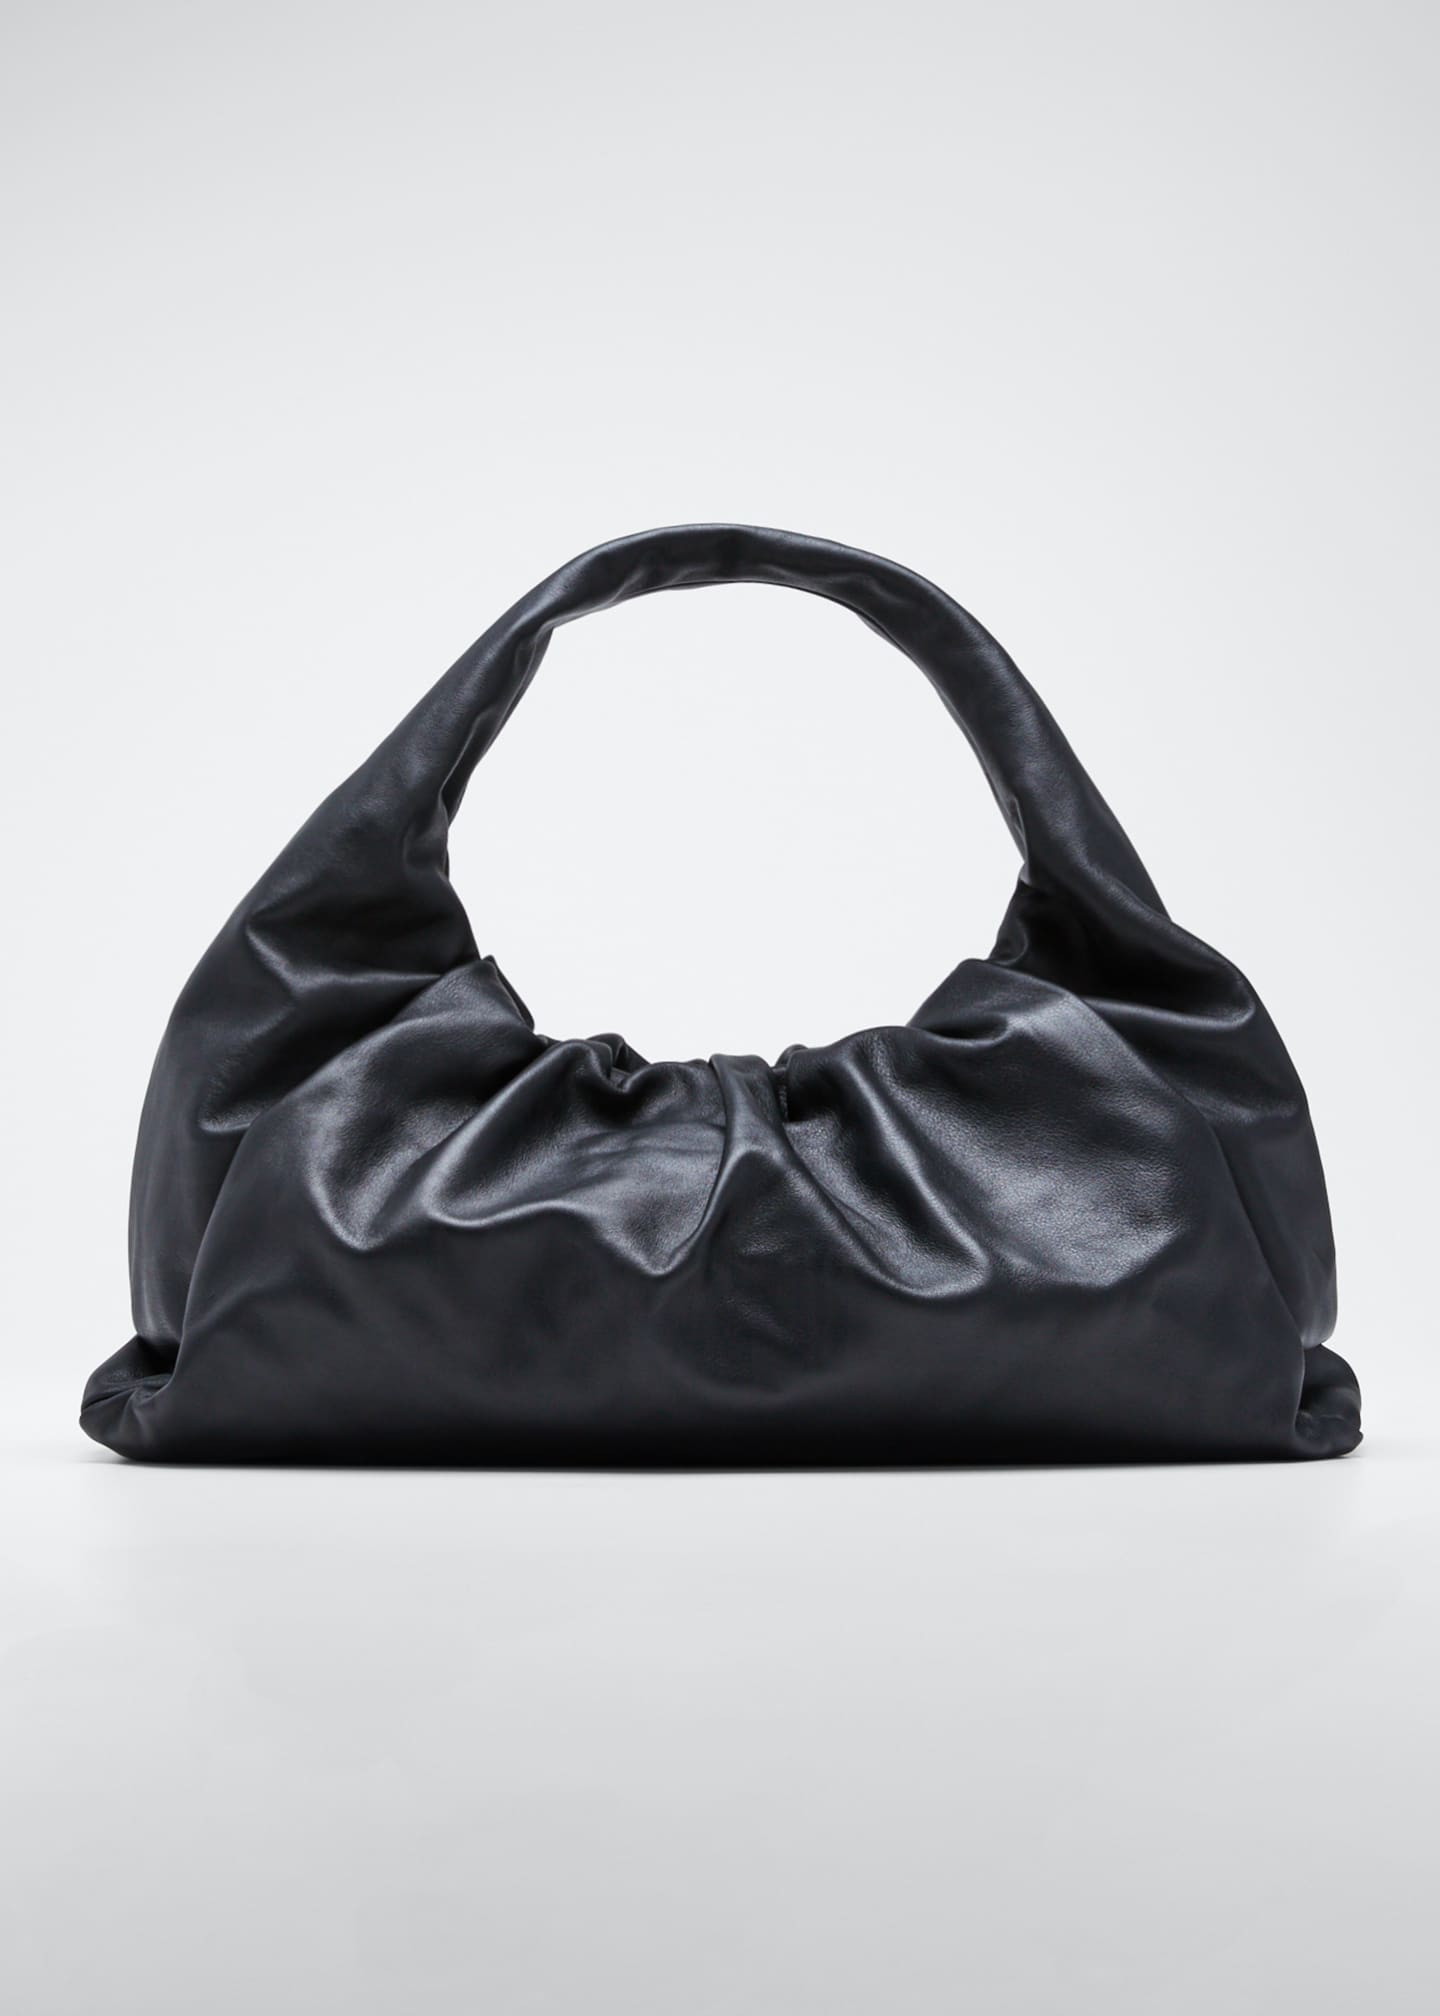 Bottega Veneta Medium Butter Napa Shoulder Hobo Bag